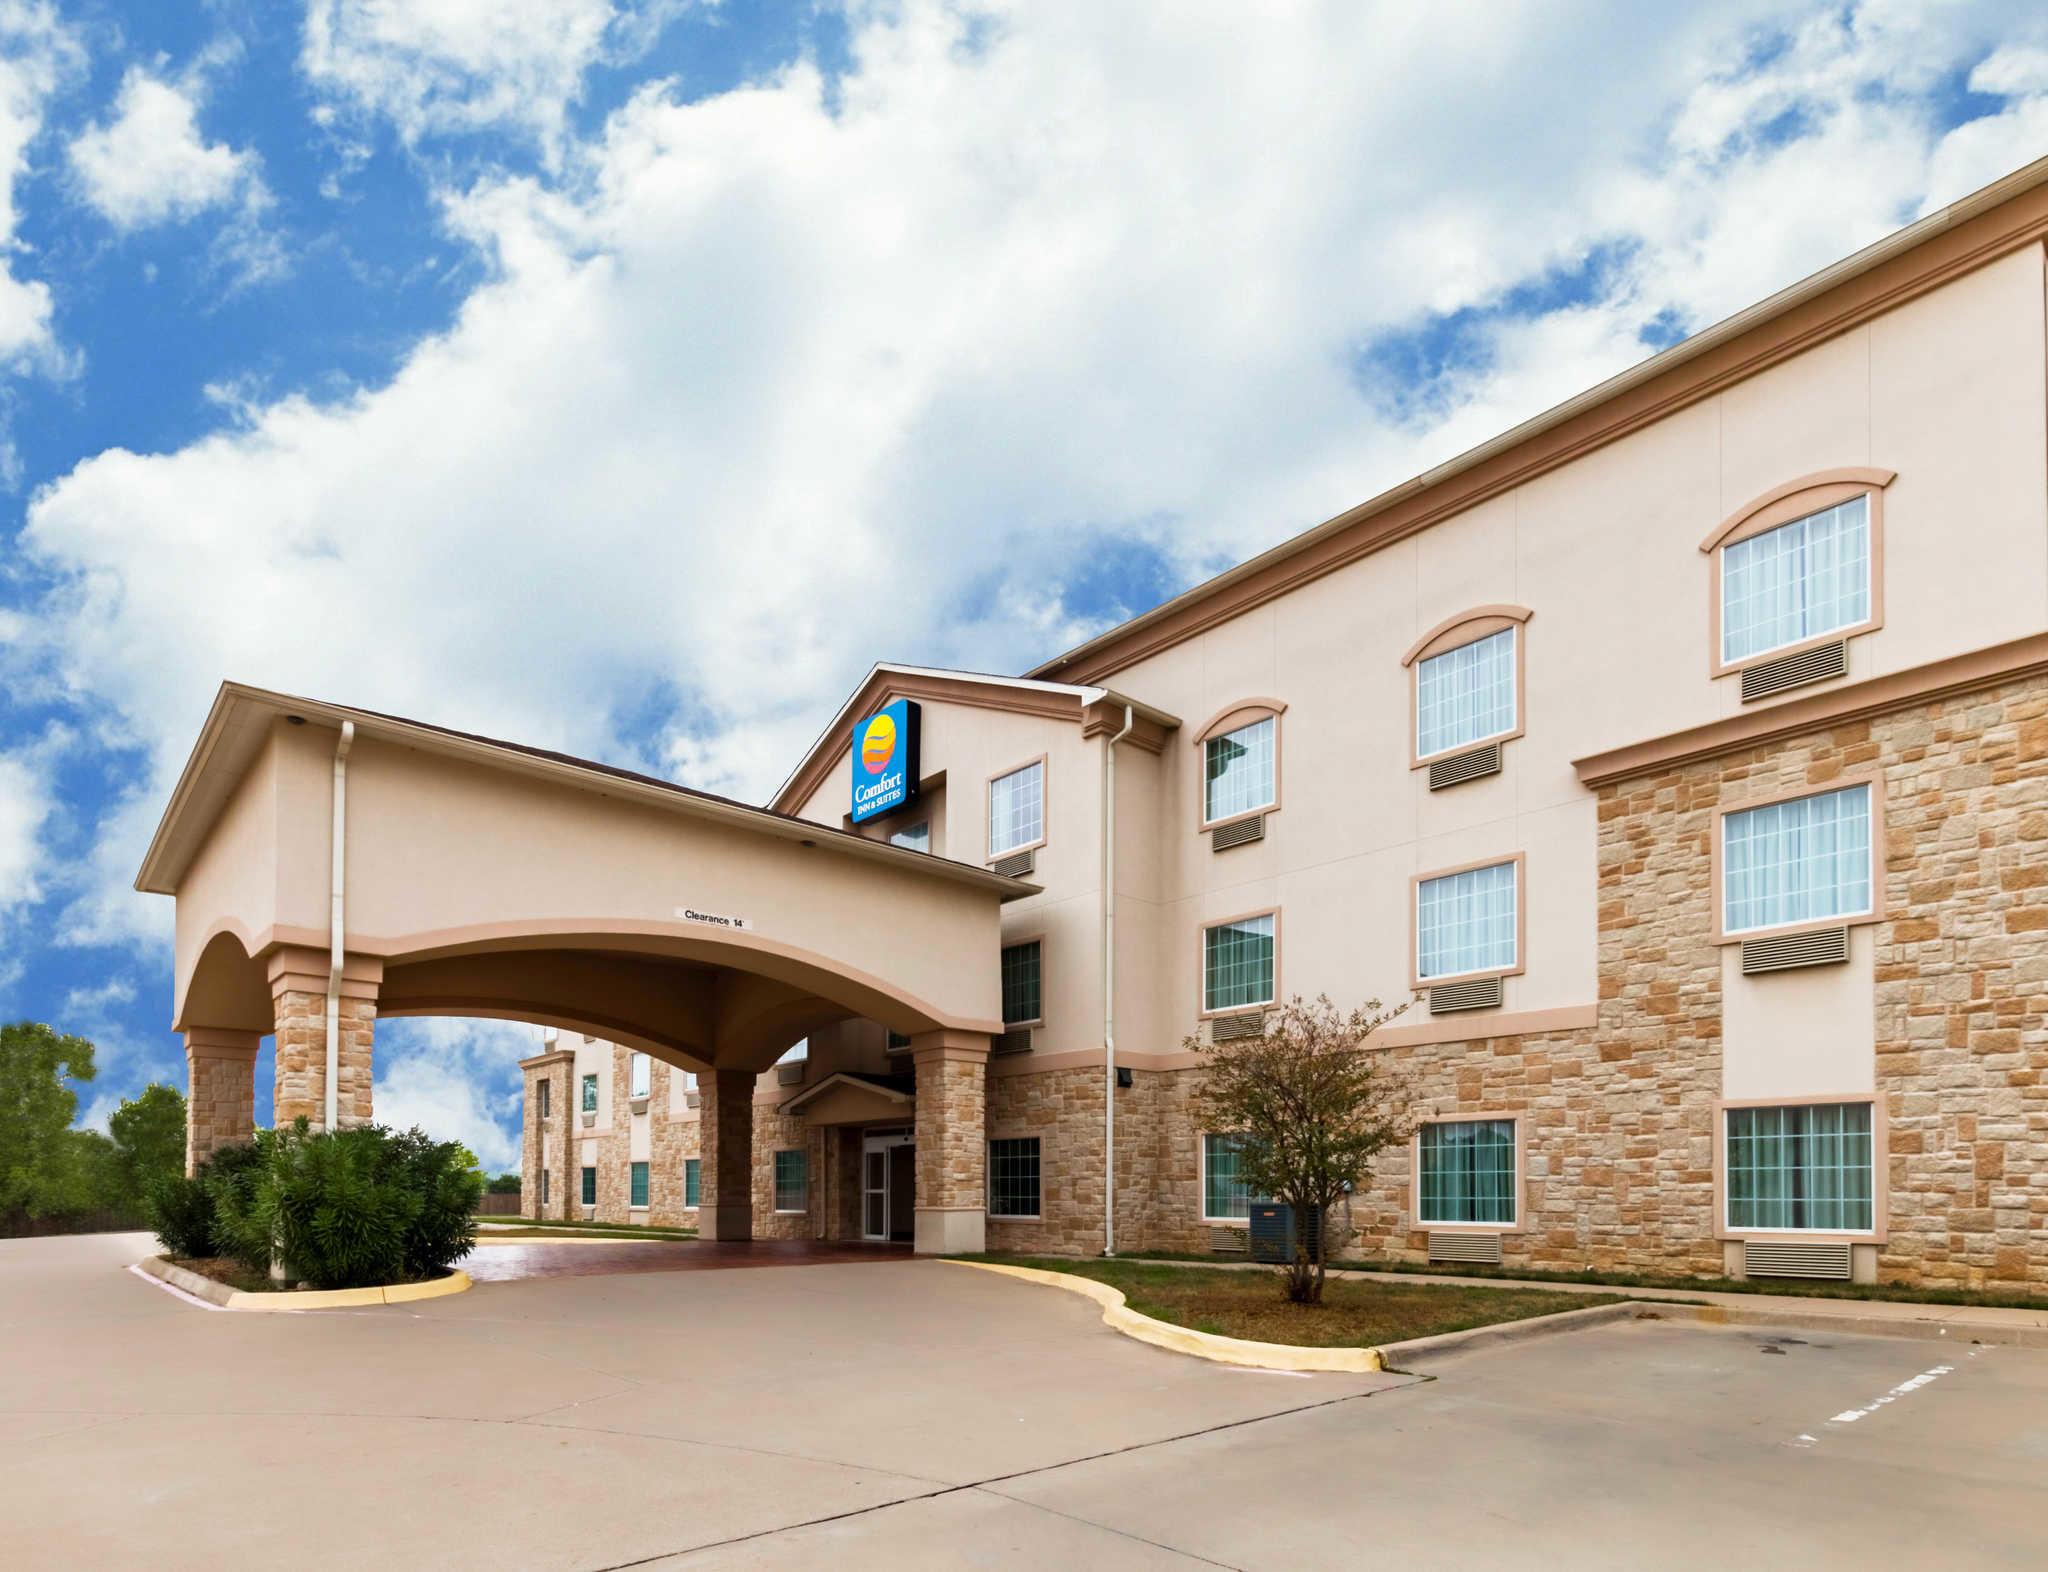 Comfort Inn & Suites near Comanche Peak image 0